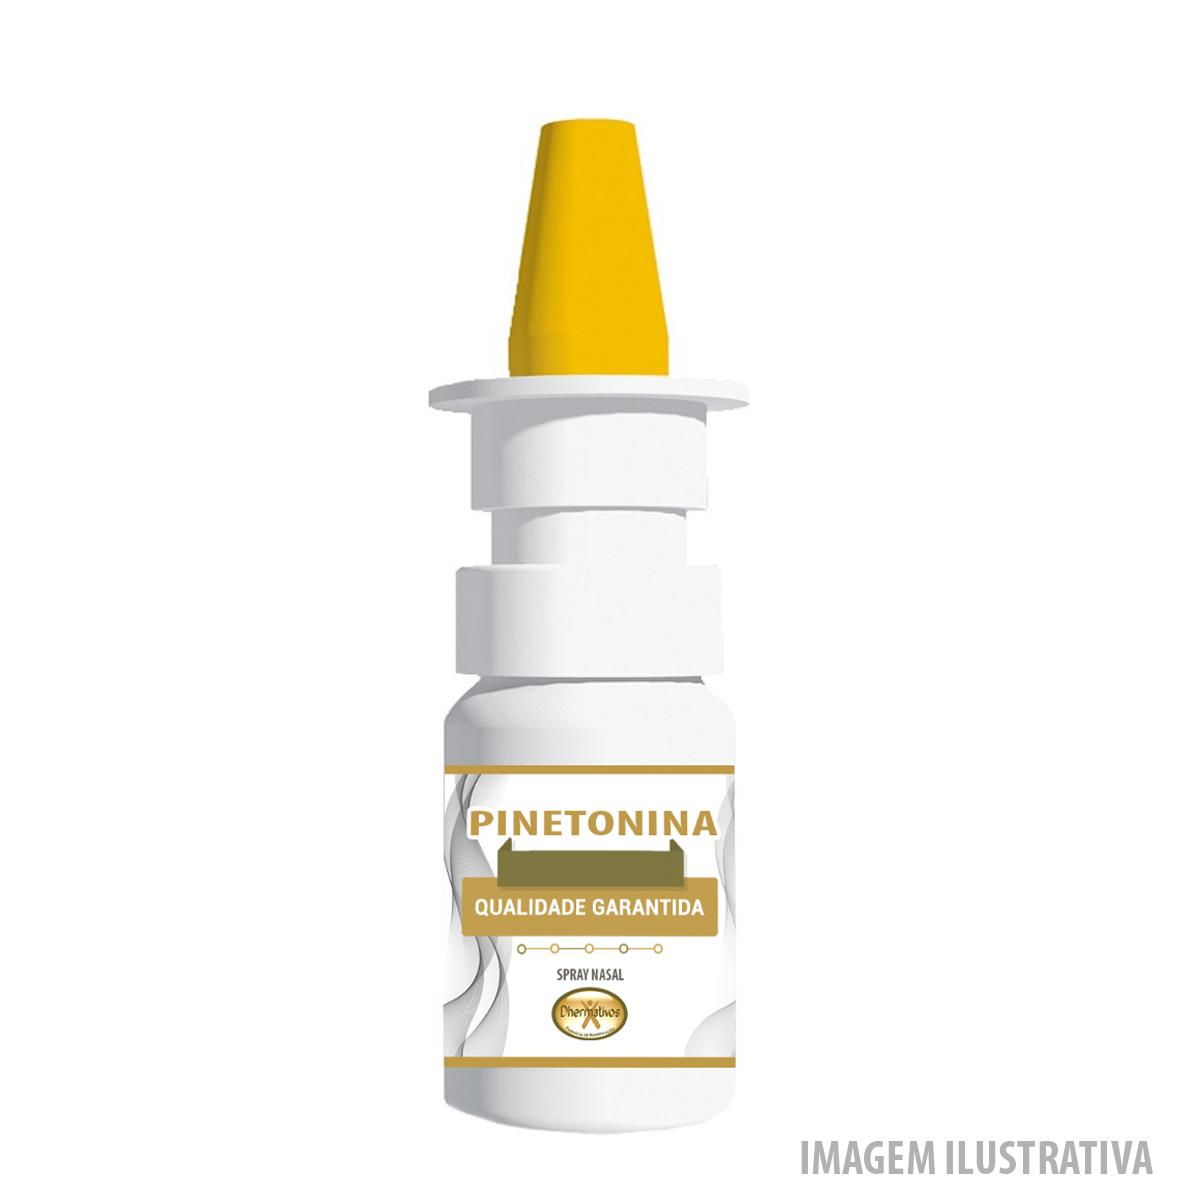 Pinetonina 50% Spray Nasal 20m